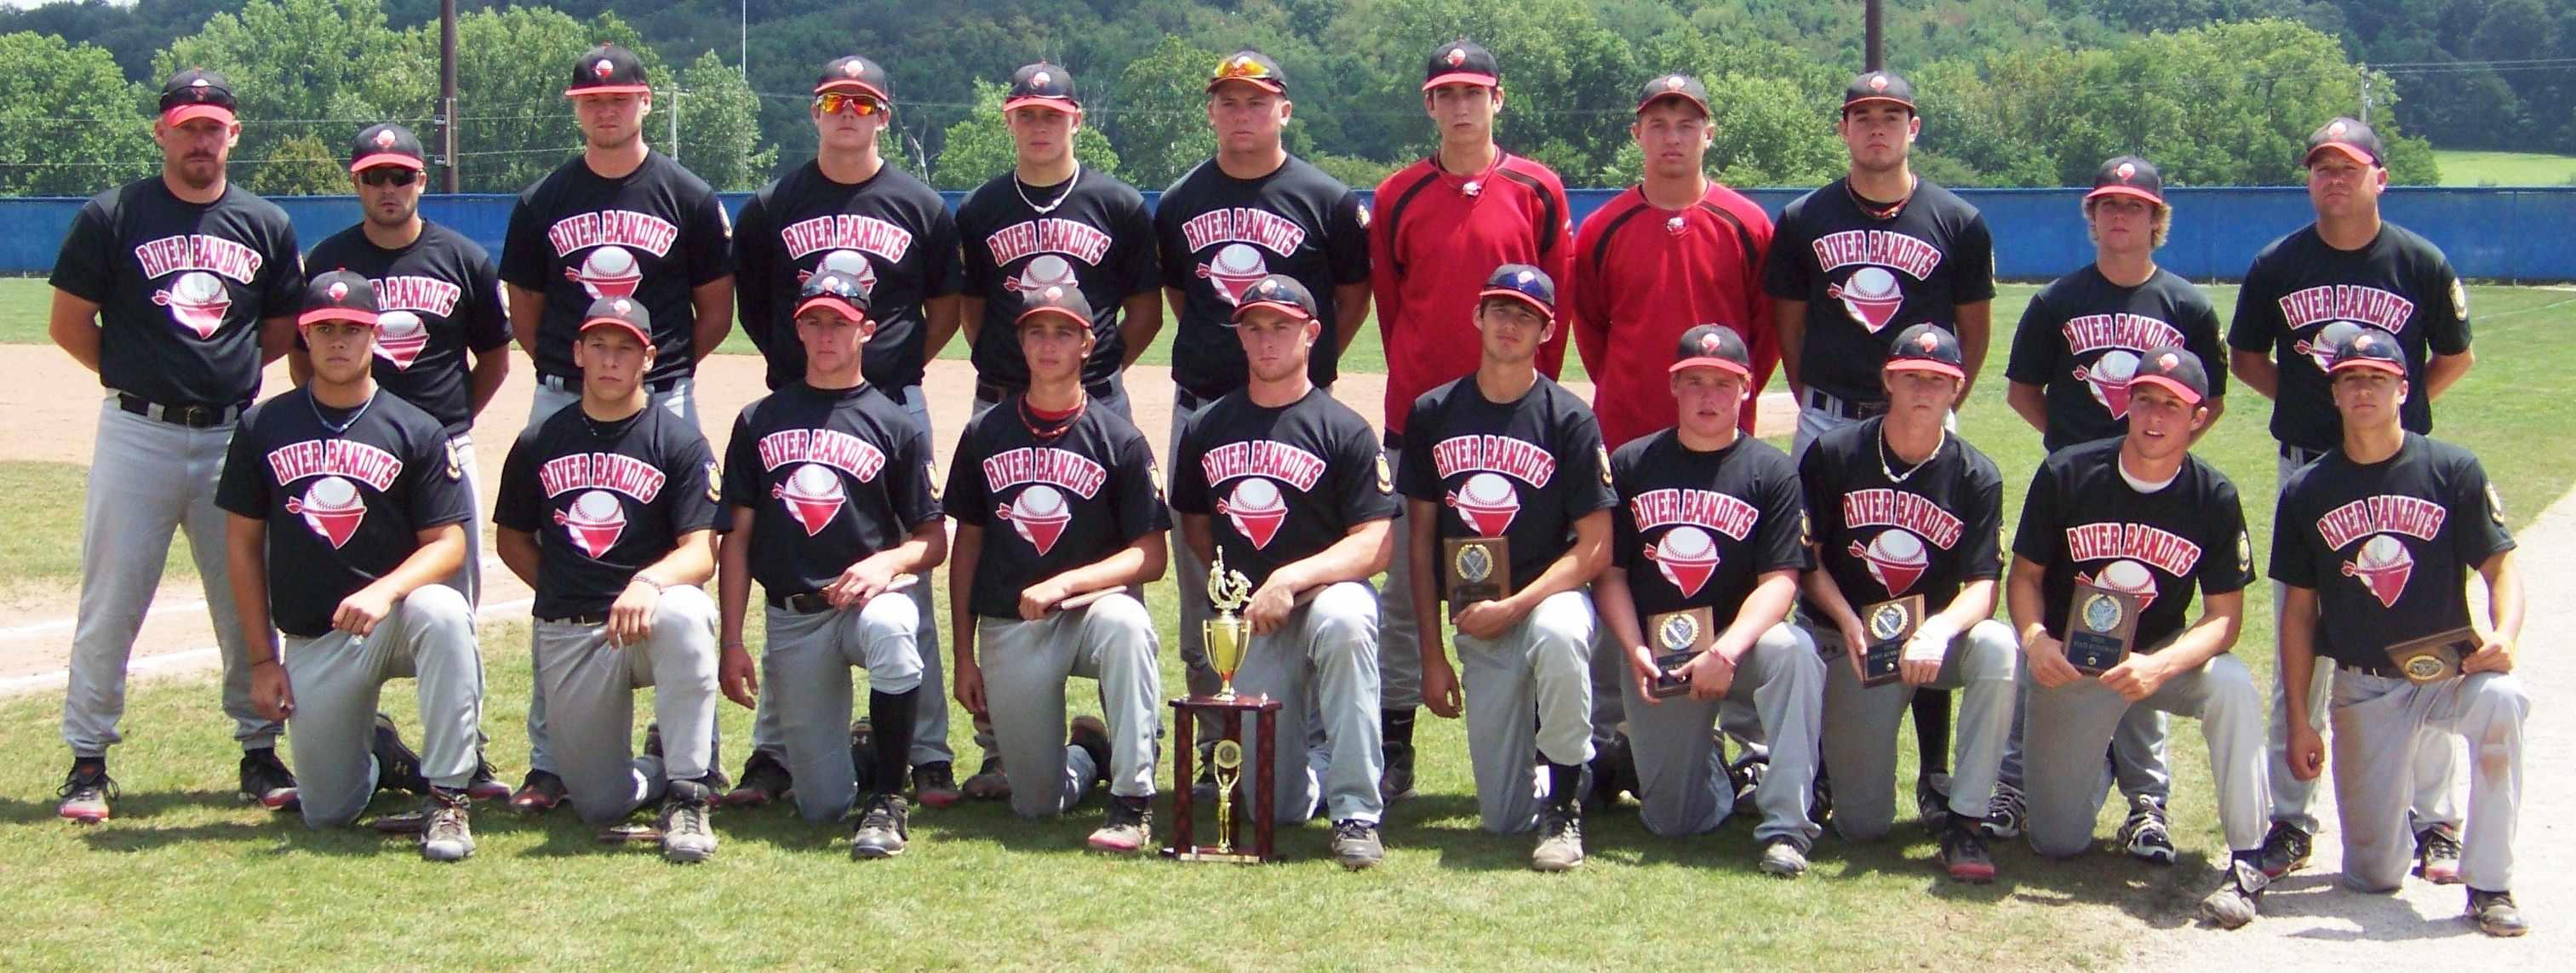 2010 Team Pic